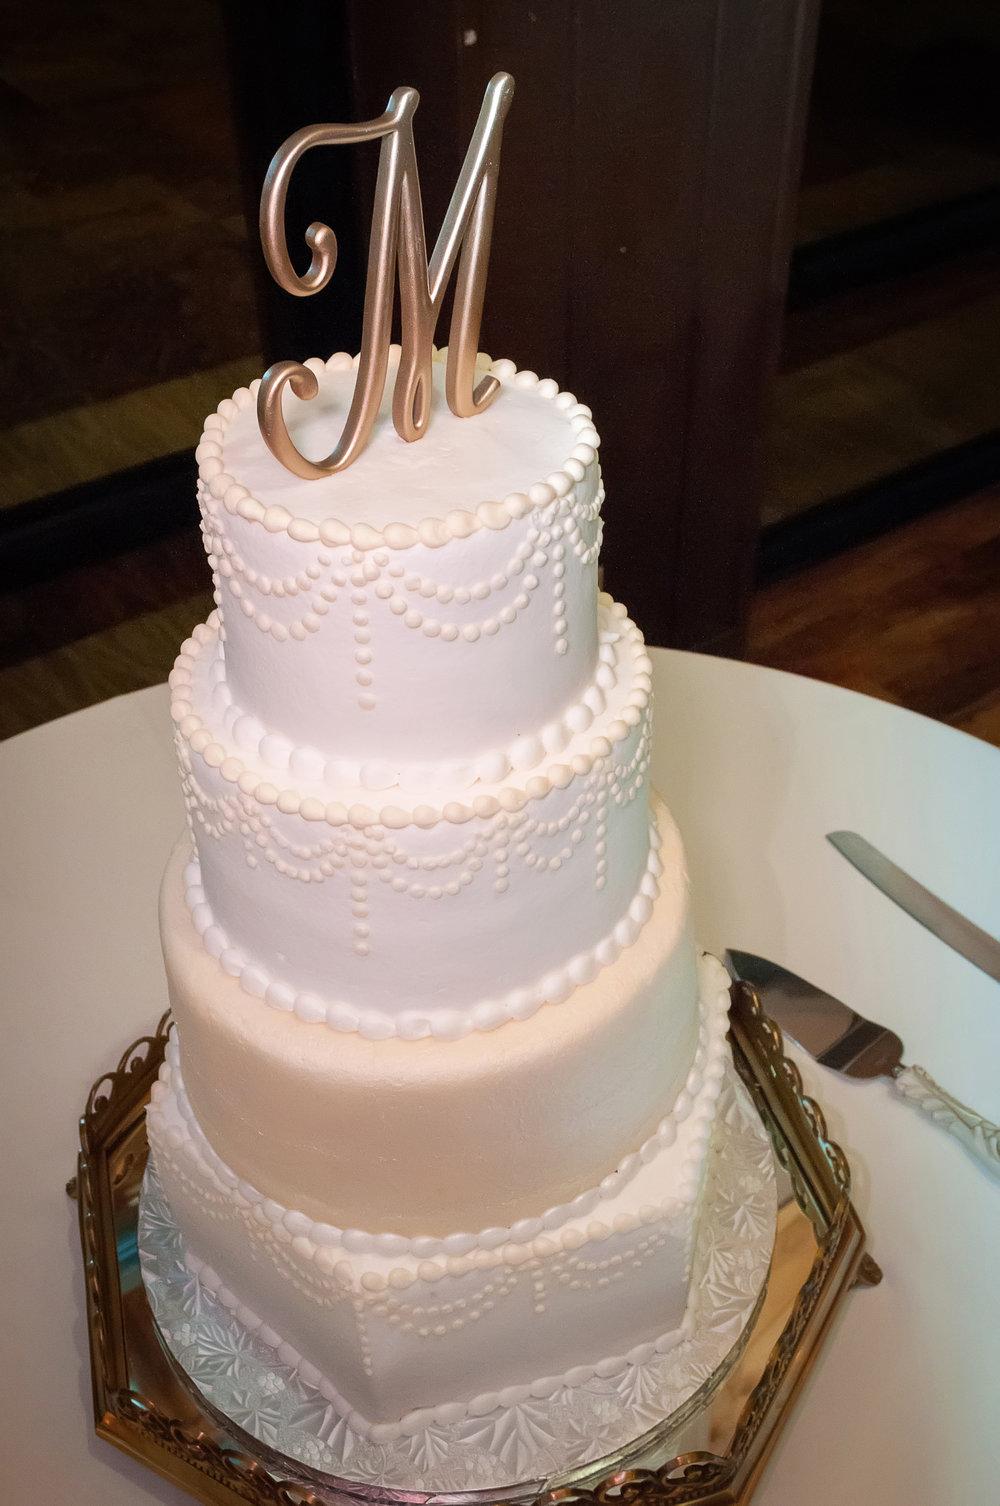 A Post Oak Lodge Vintage Wedding -- Oklahoma Wedding - Wedding Blog -- The Overwhelmed Bride